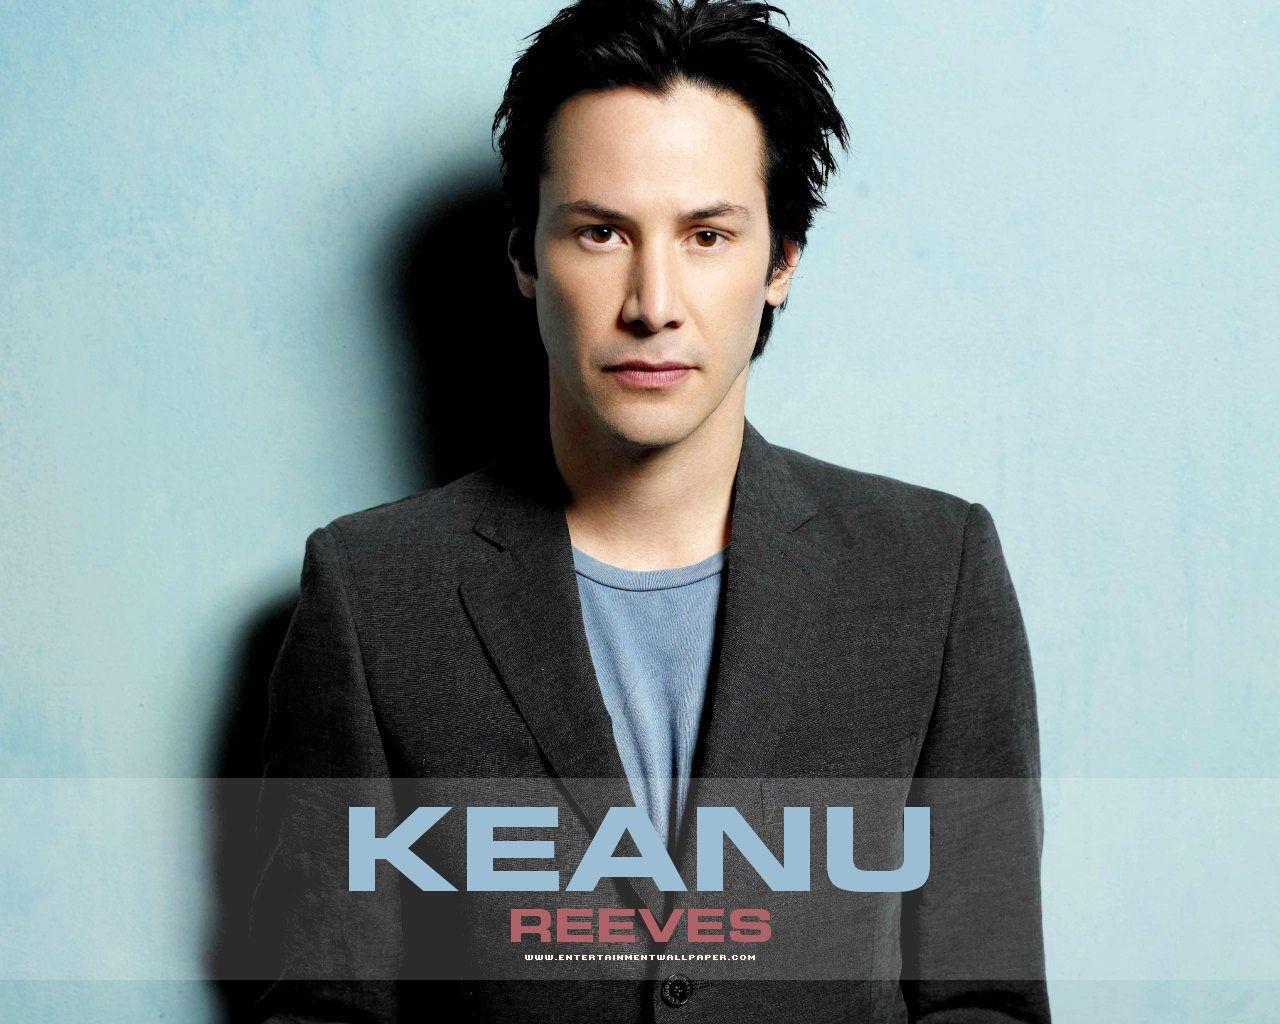 keanu reeves wallpaper - #30015388 (1280x1024) | desktop download